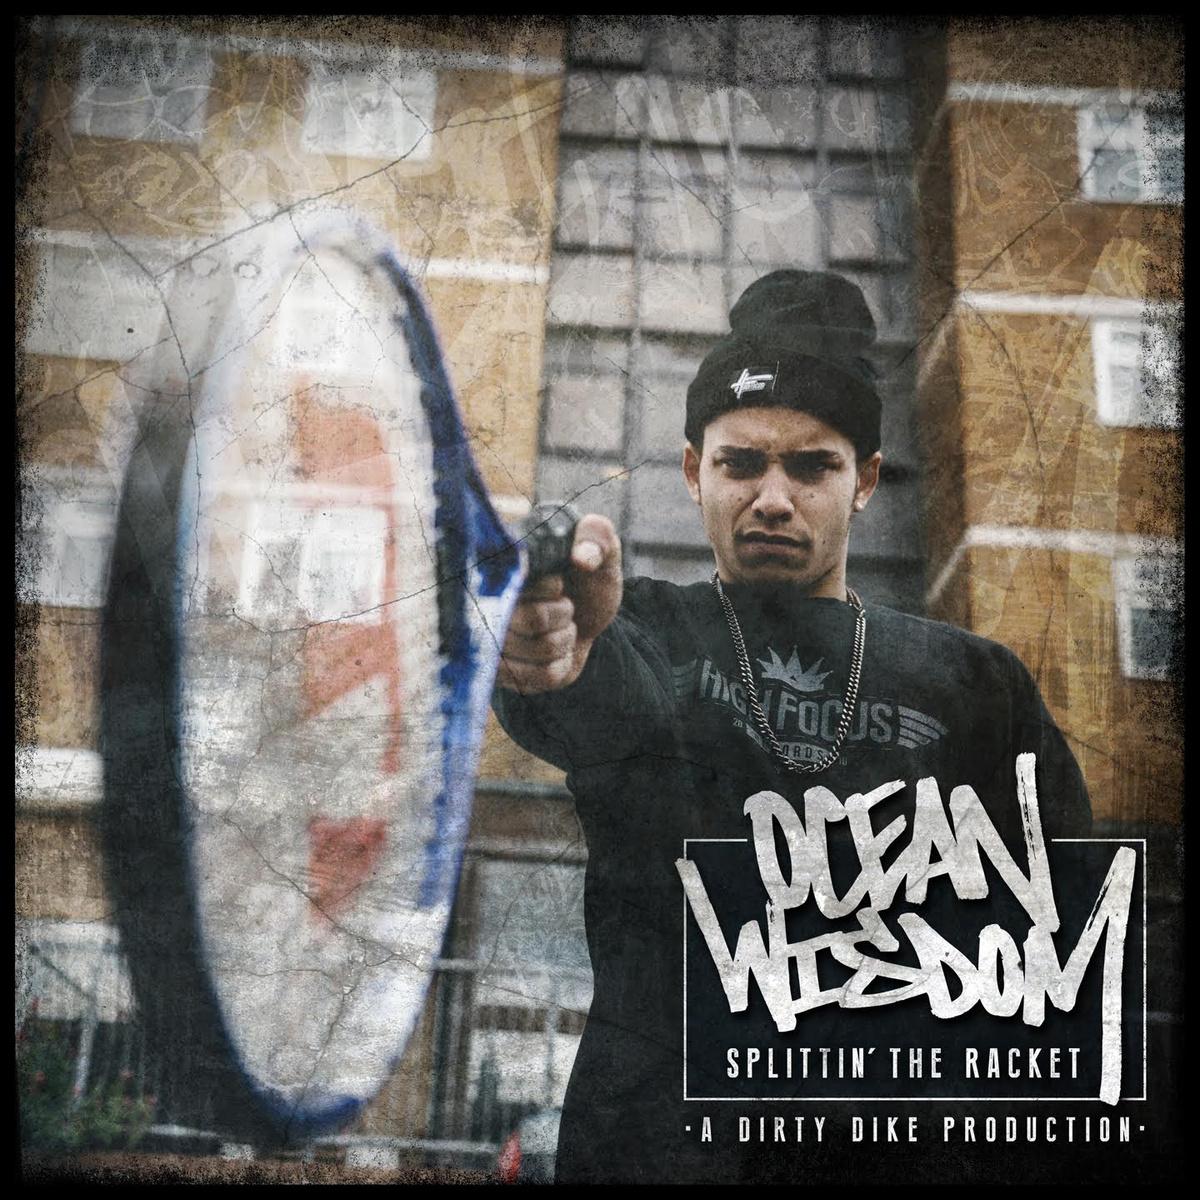 Ocean Wisdom - Splittin' The Racket